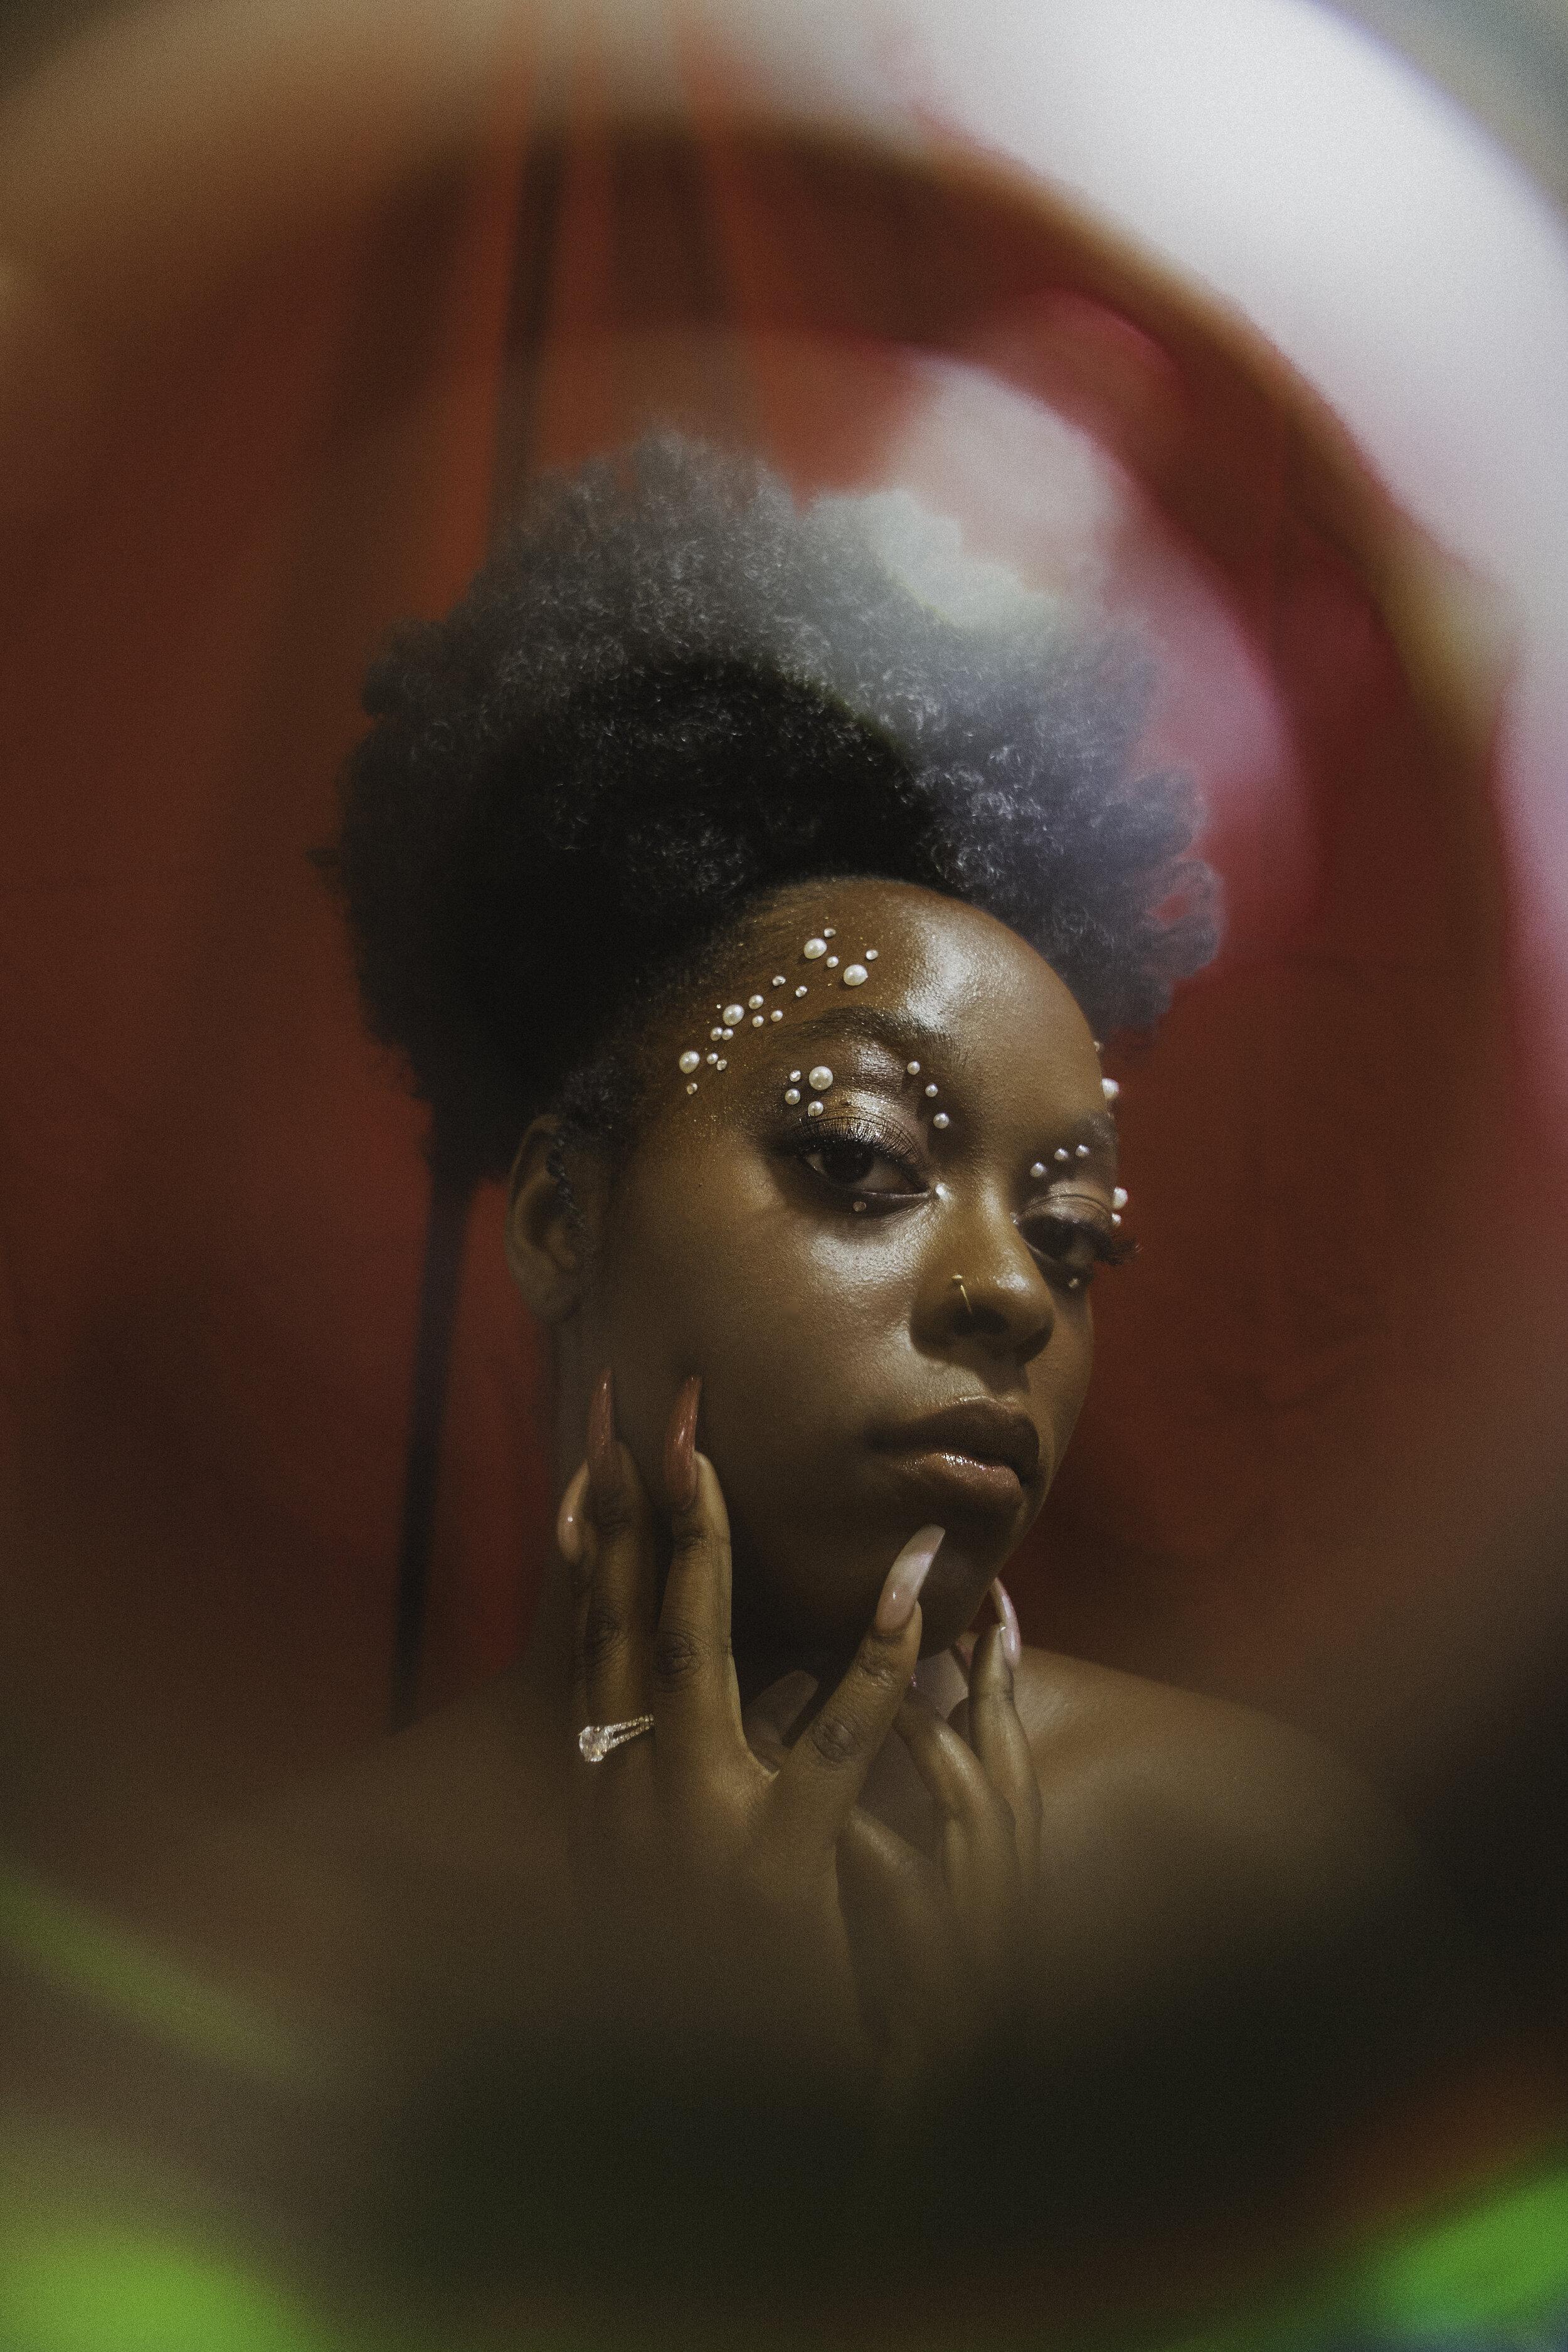 Creative Director - @ Stephanie E. Garced  | Photographer - @ Amy Paraskeva  | Makeup Artist - @ Minorca M. Sanchez